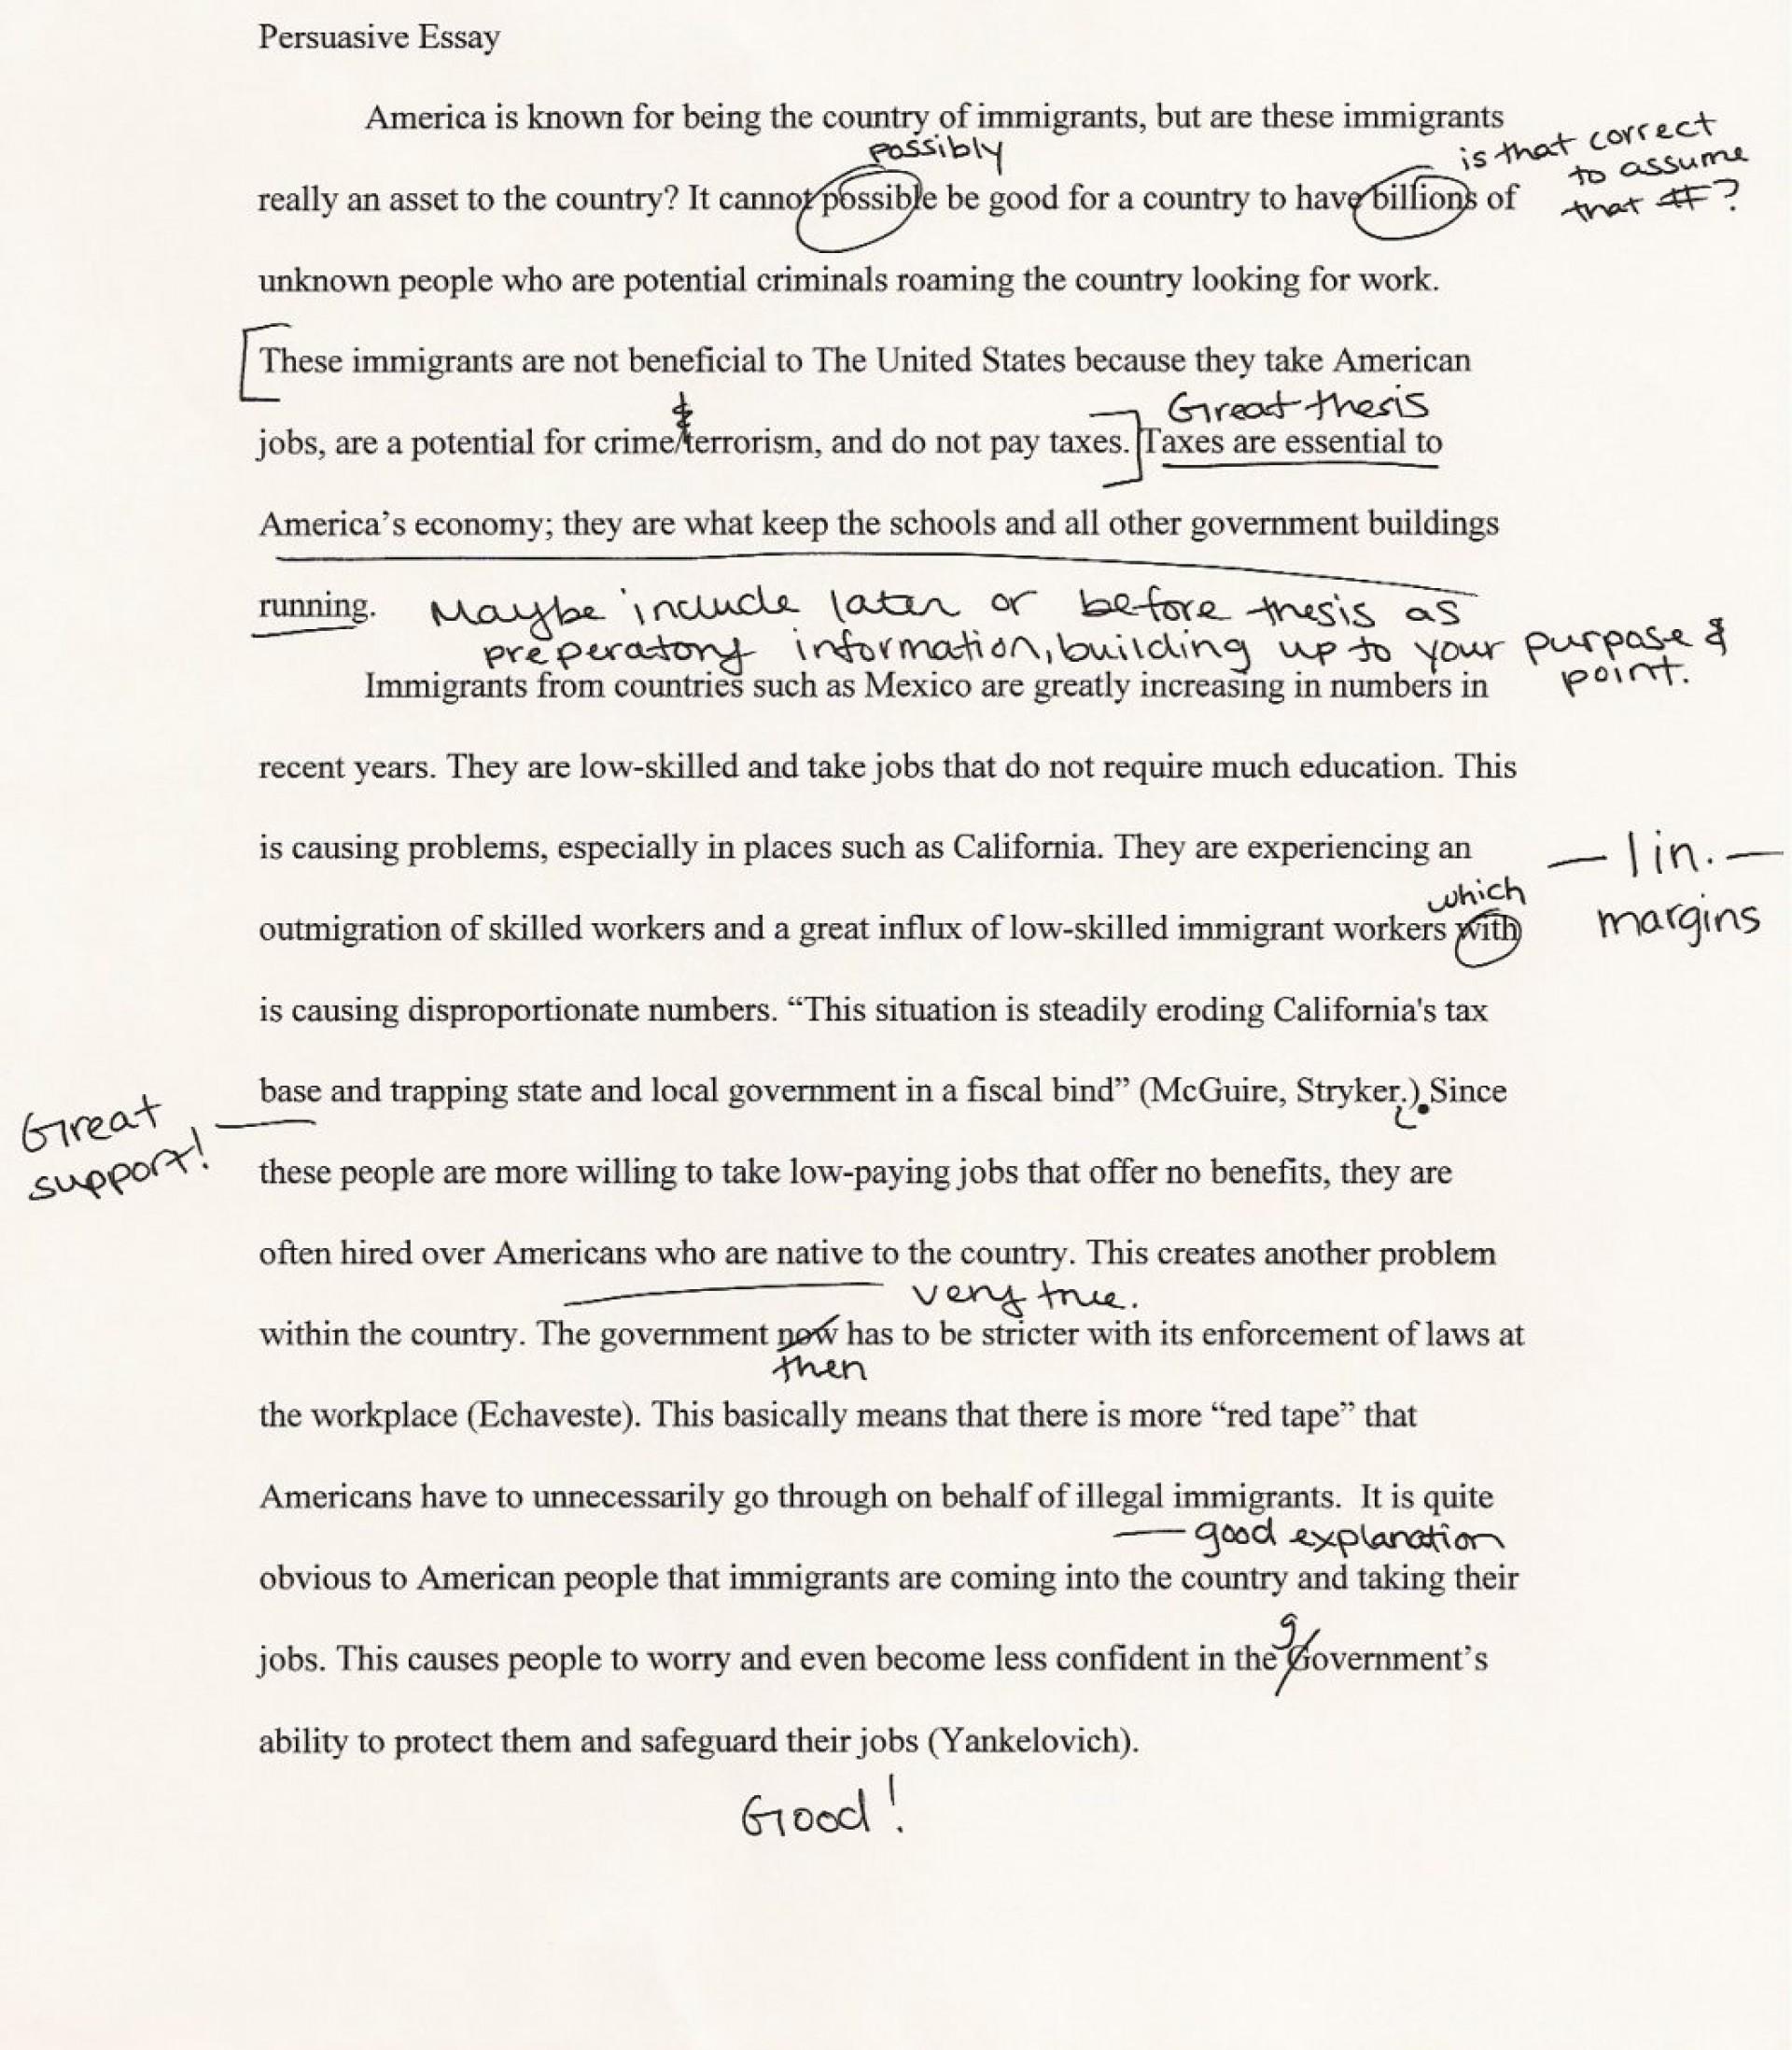 002 Essay Example Hook Examples Essays Good Hooks For College Persu Best Excellent Persuasive Narrative 1920